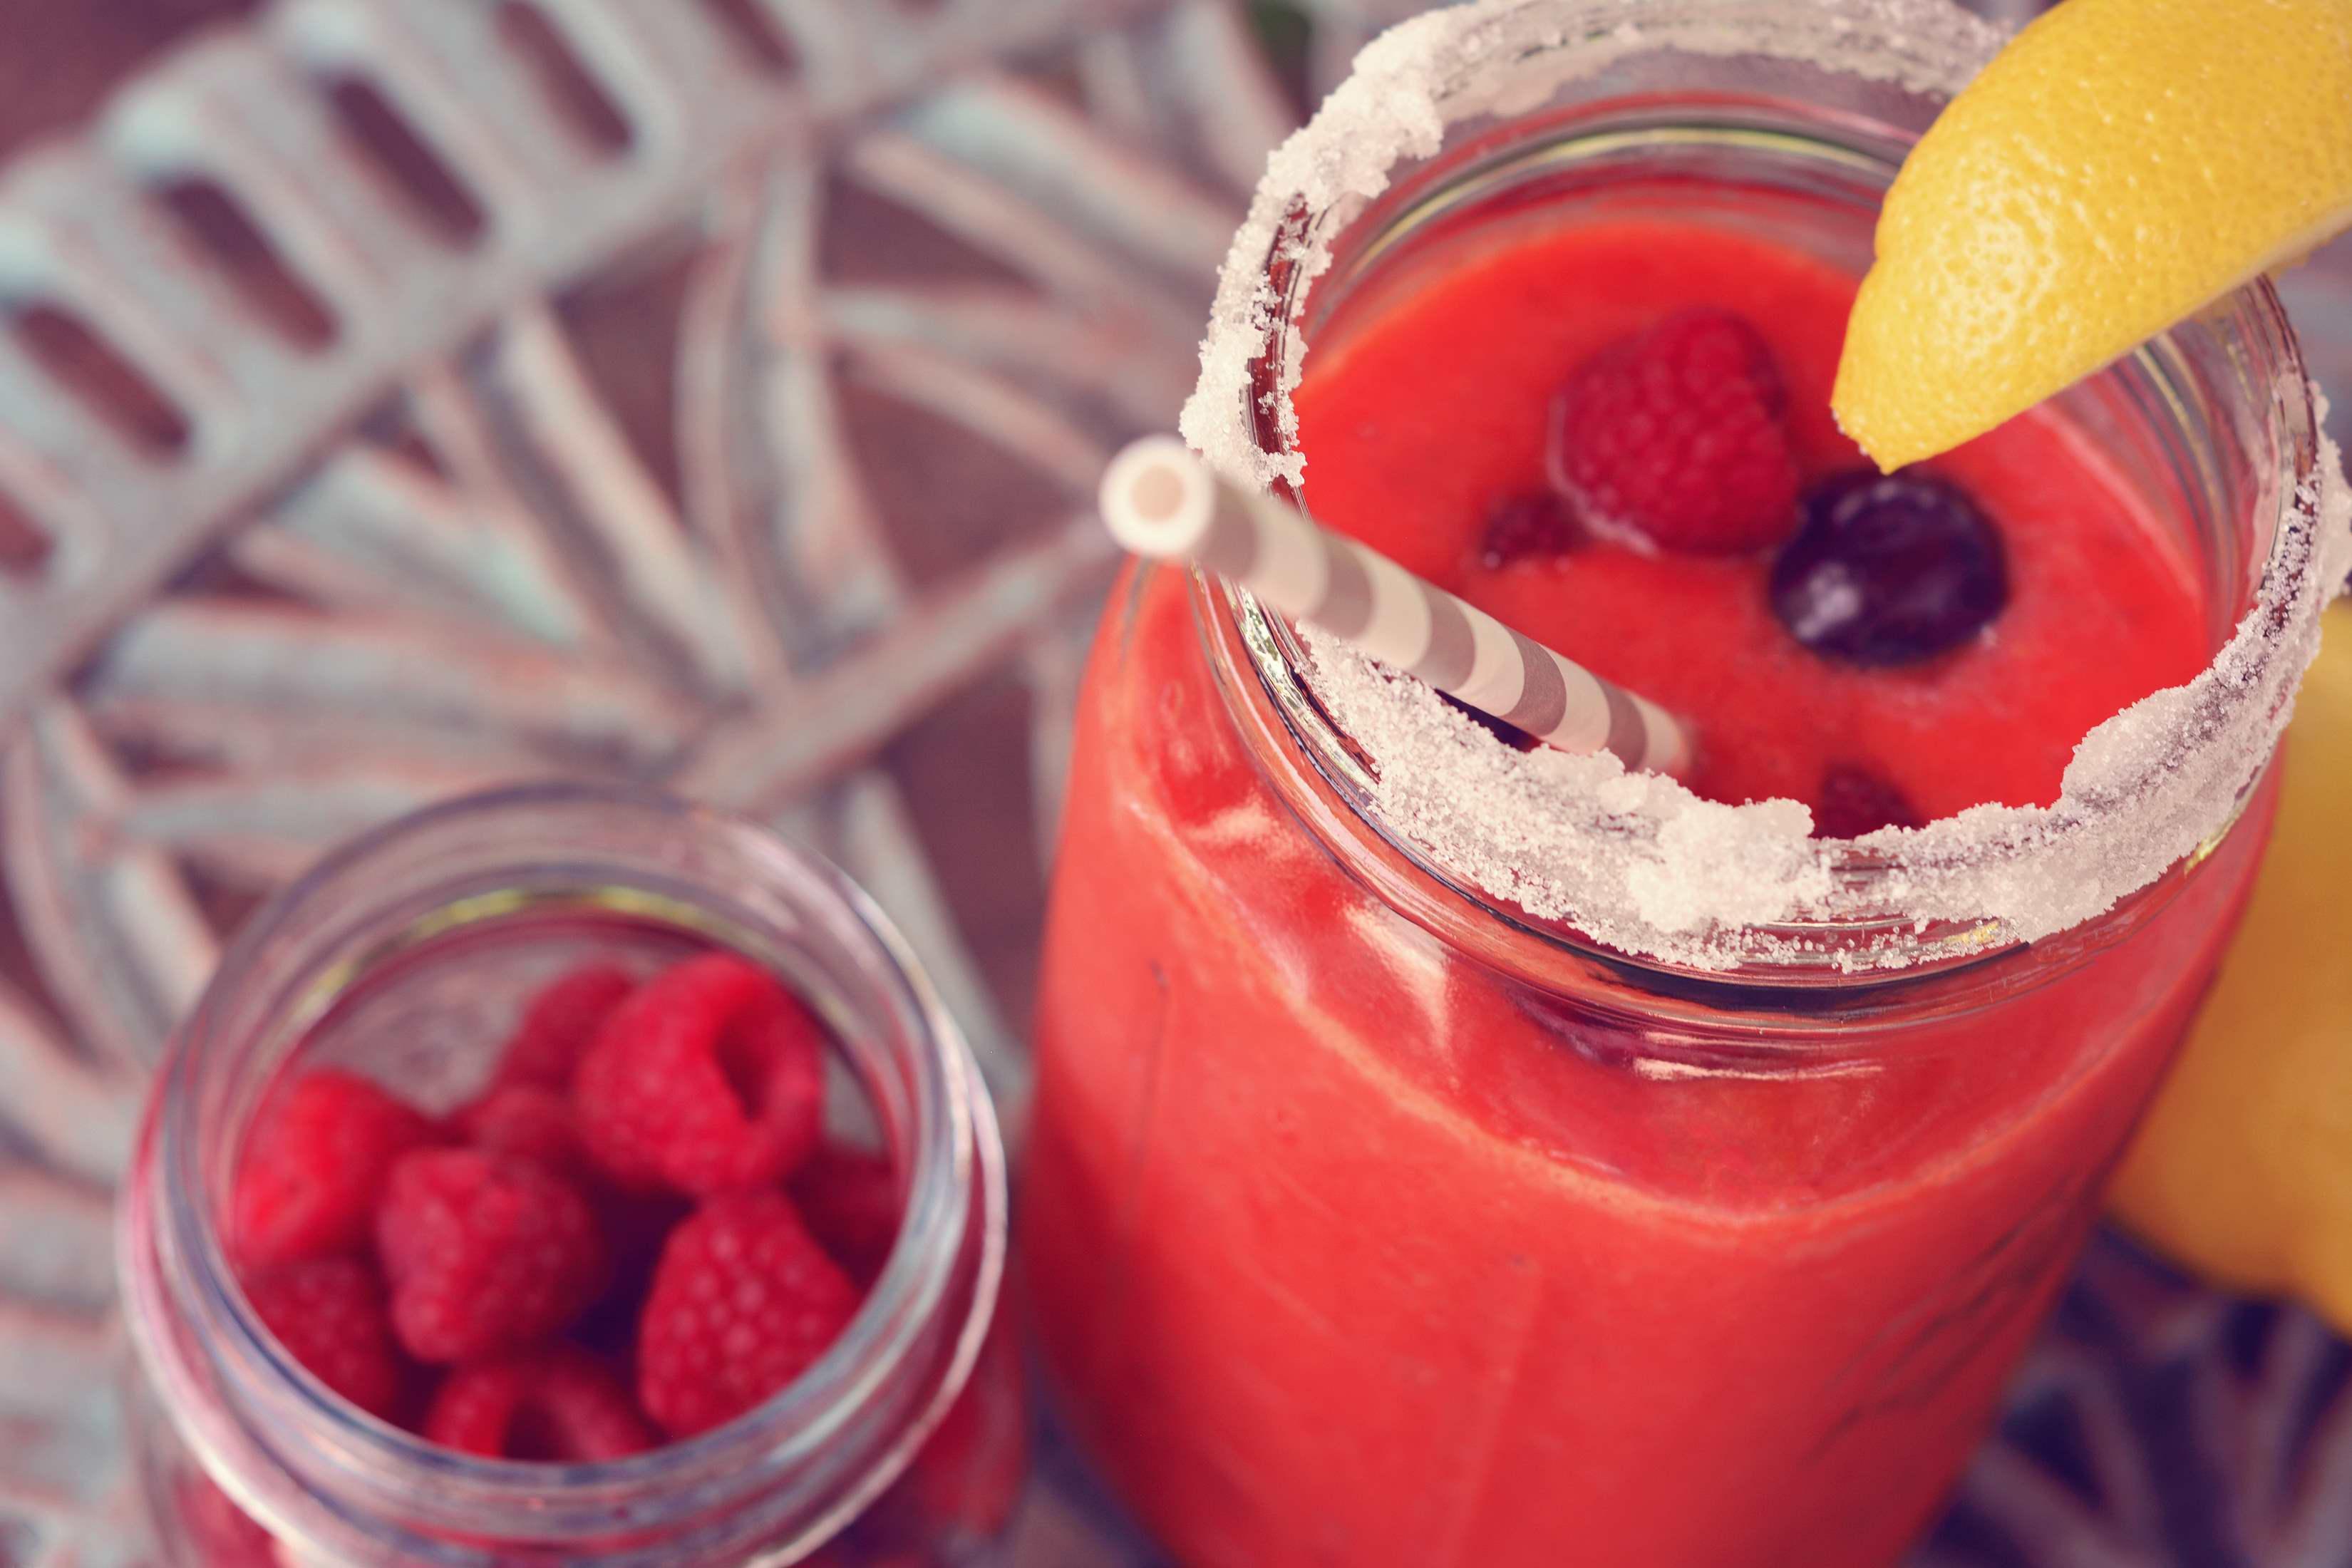 – 10 b nutriblend smoothie raspberry lemon strawberry fitness drink food photographer miami south florida photography fruit_01